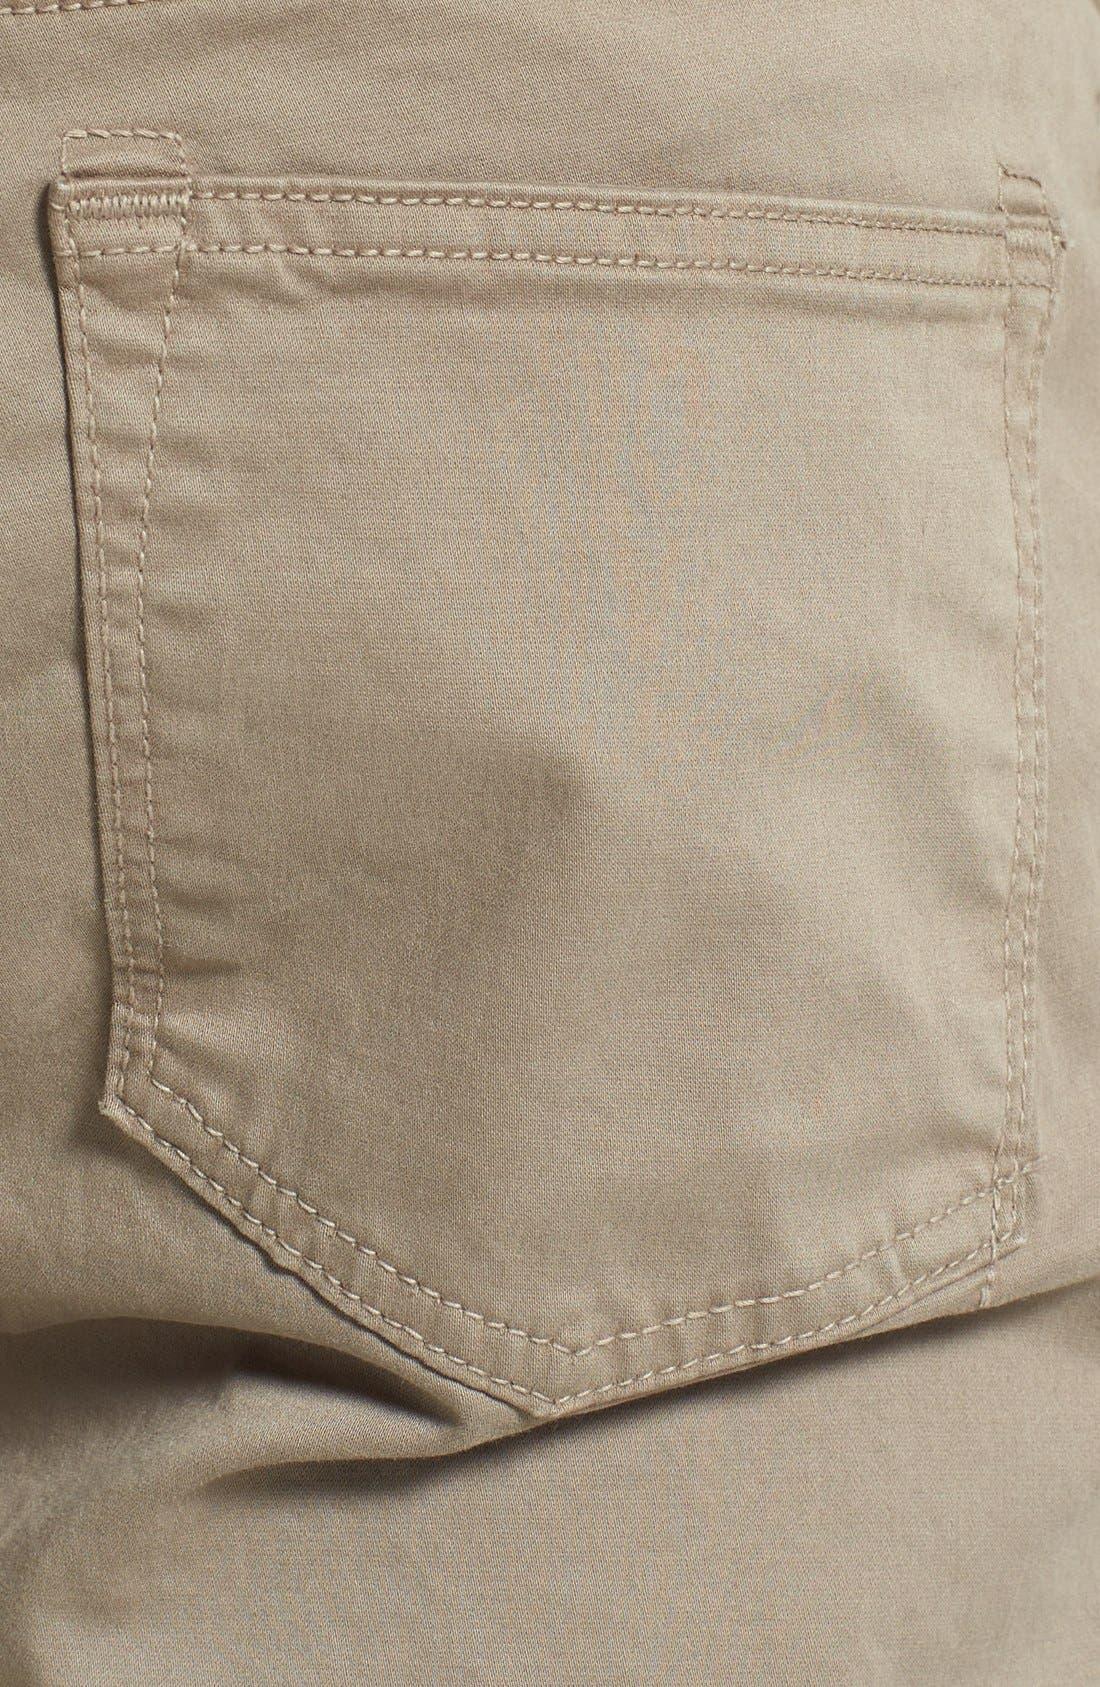 'Kane' Slim Fit Cotton Twill Pants,                             Alternate thumbnail 41, color,